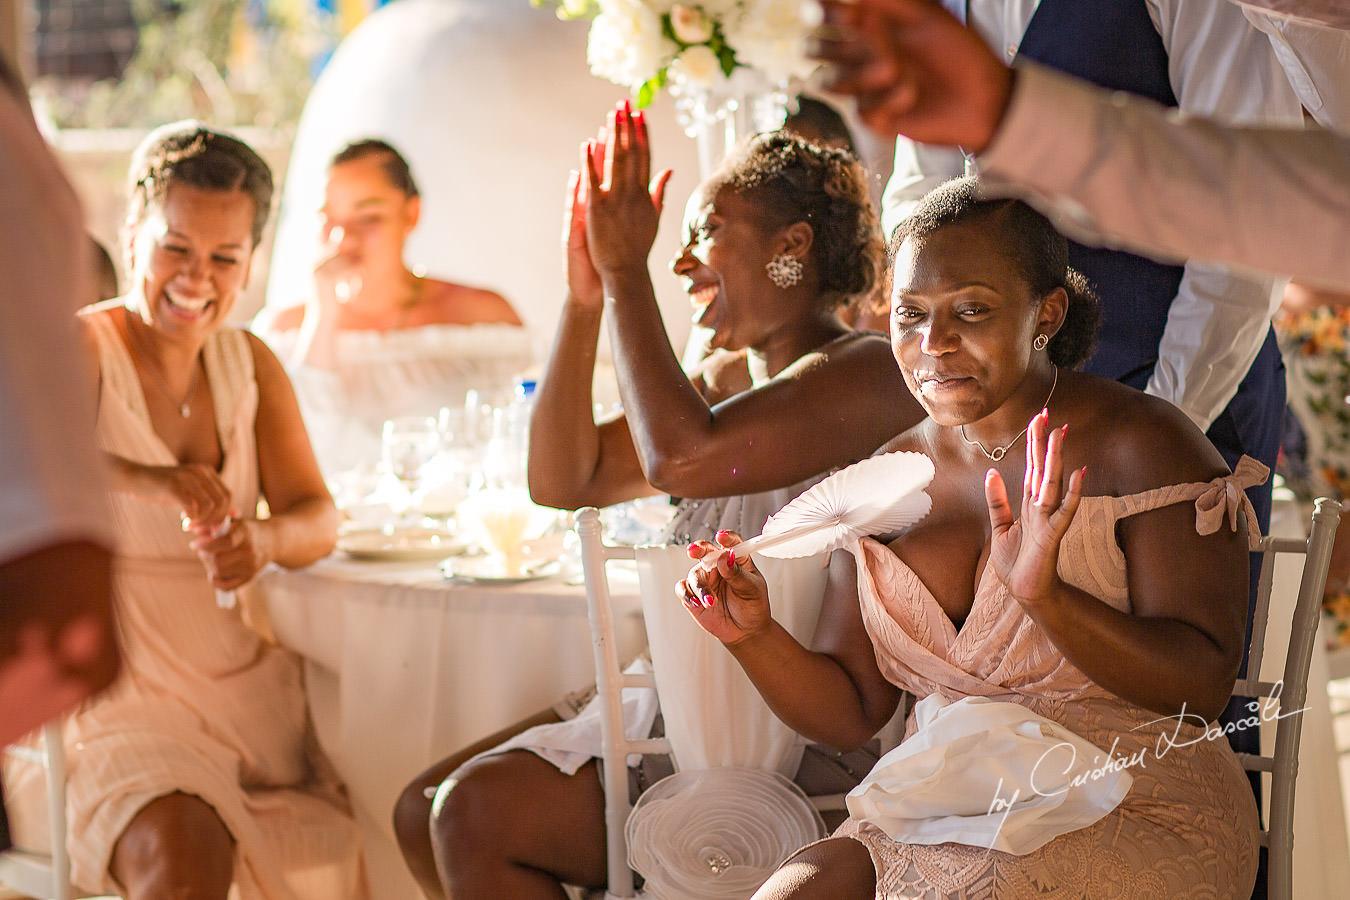 Emotional Wedding at Coral Beach Hotel & Resort. Photography by Cyprus Photographer Cristian Dascalu